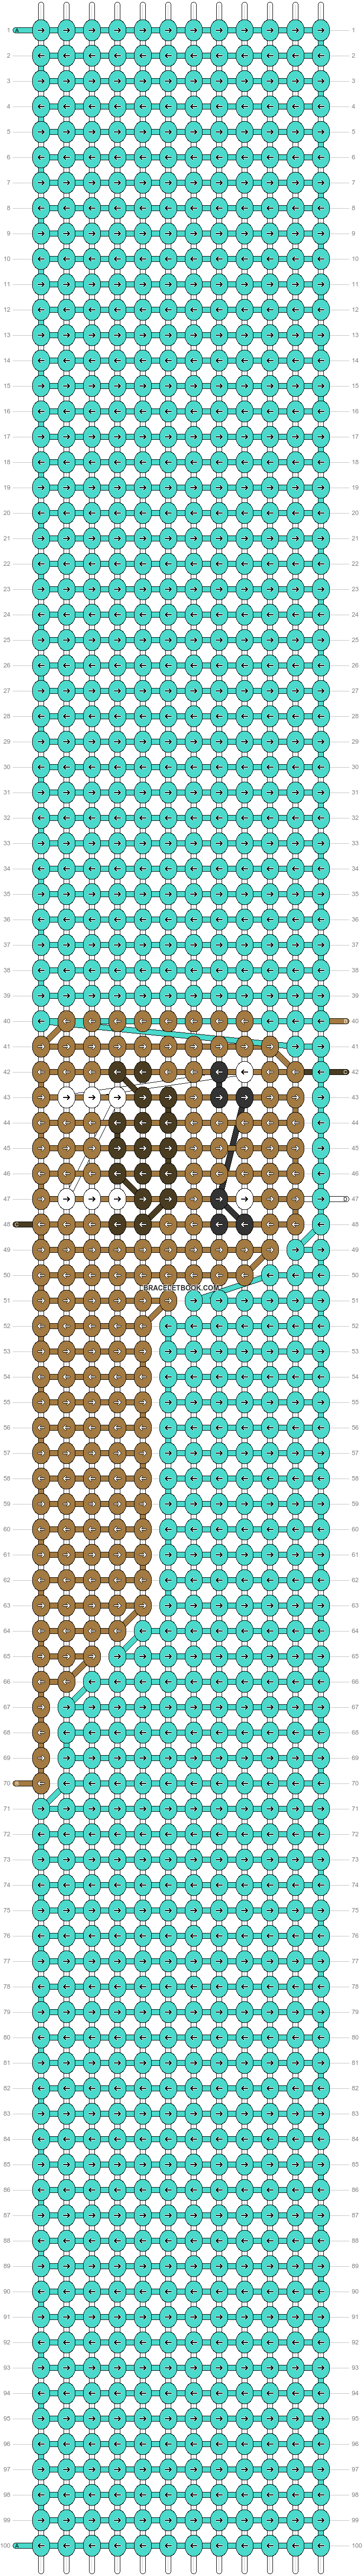 Alpha pattern #57329 pattern